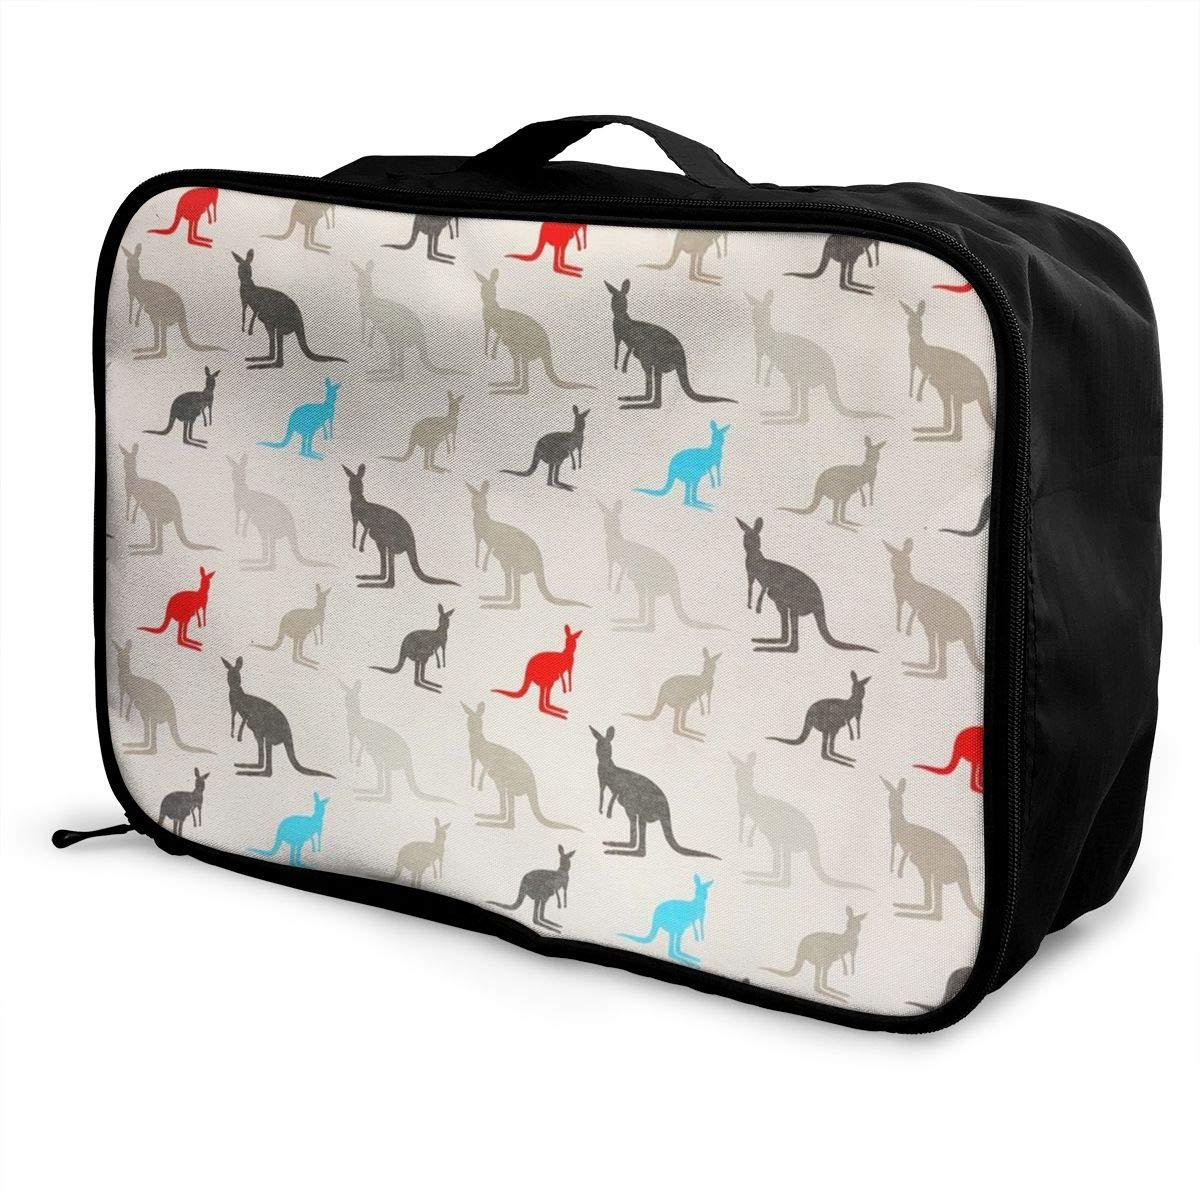 Australian Shepherd Dogs YINLAN Waterproof Foldable Duffel Fashion Casual Storage Tote Bag Lightweight Large Capacity Portable Luggage Bag for Women and Men